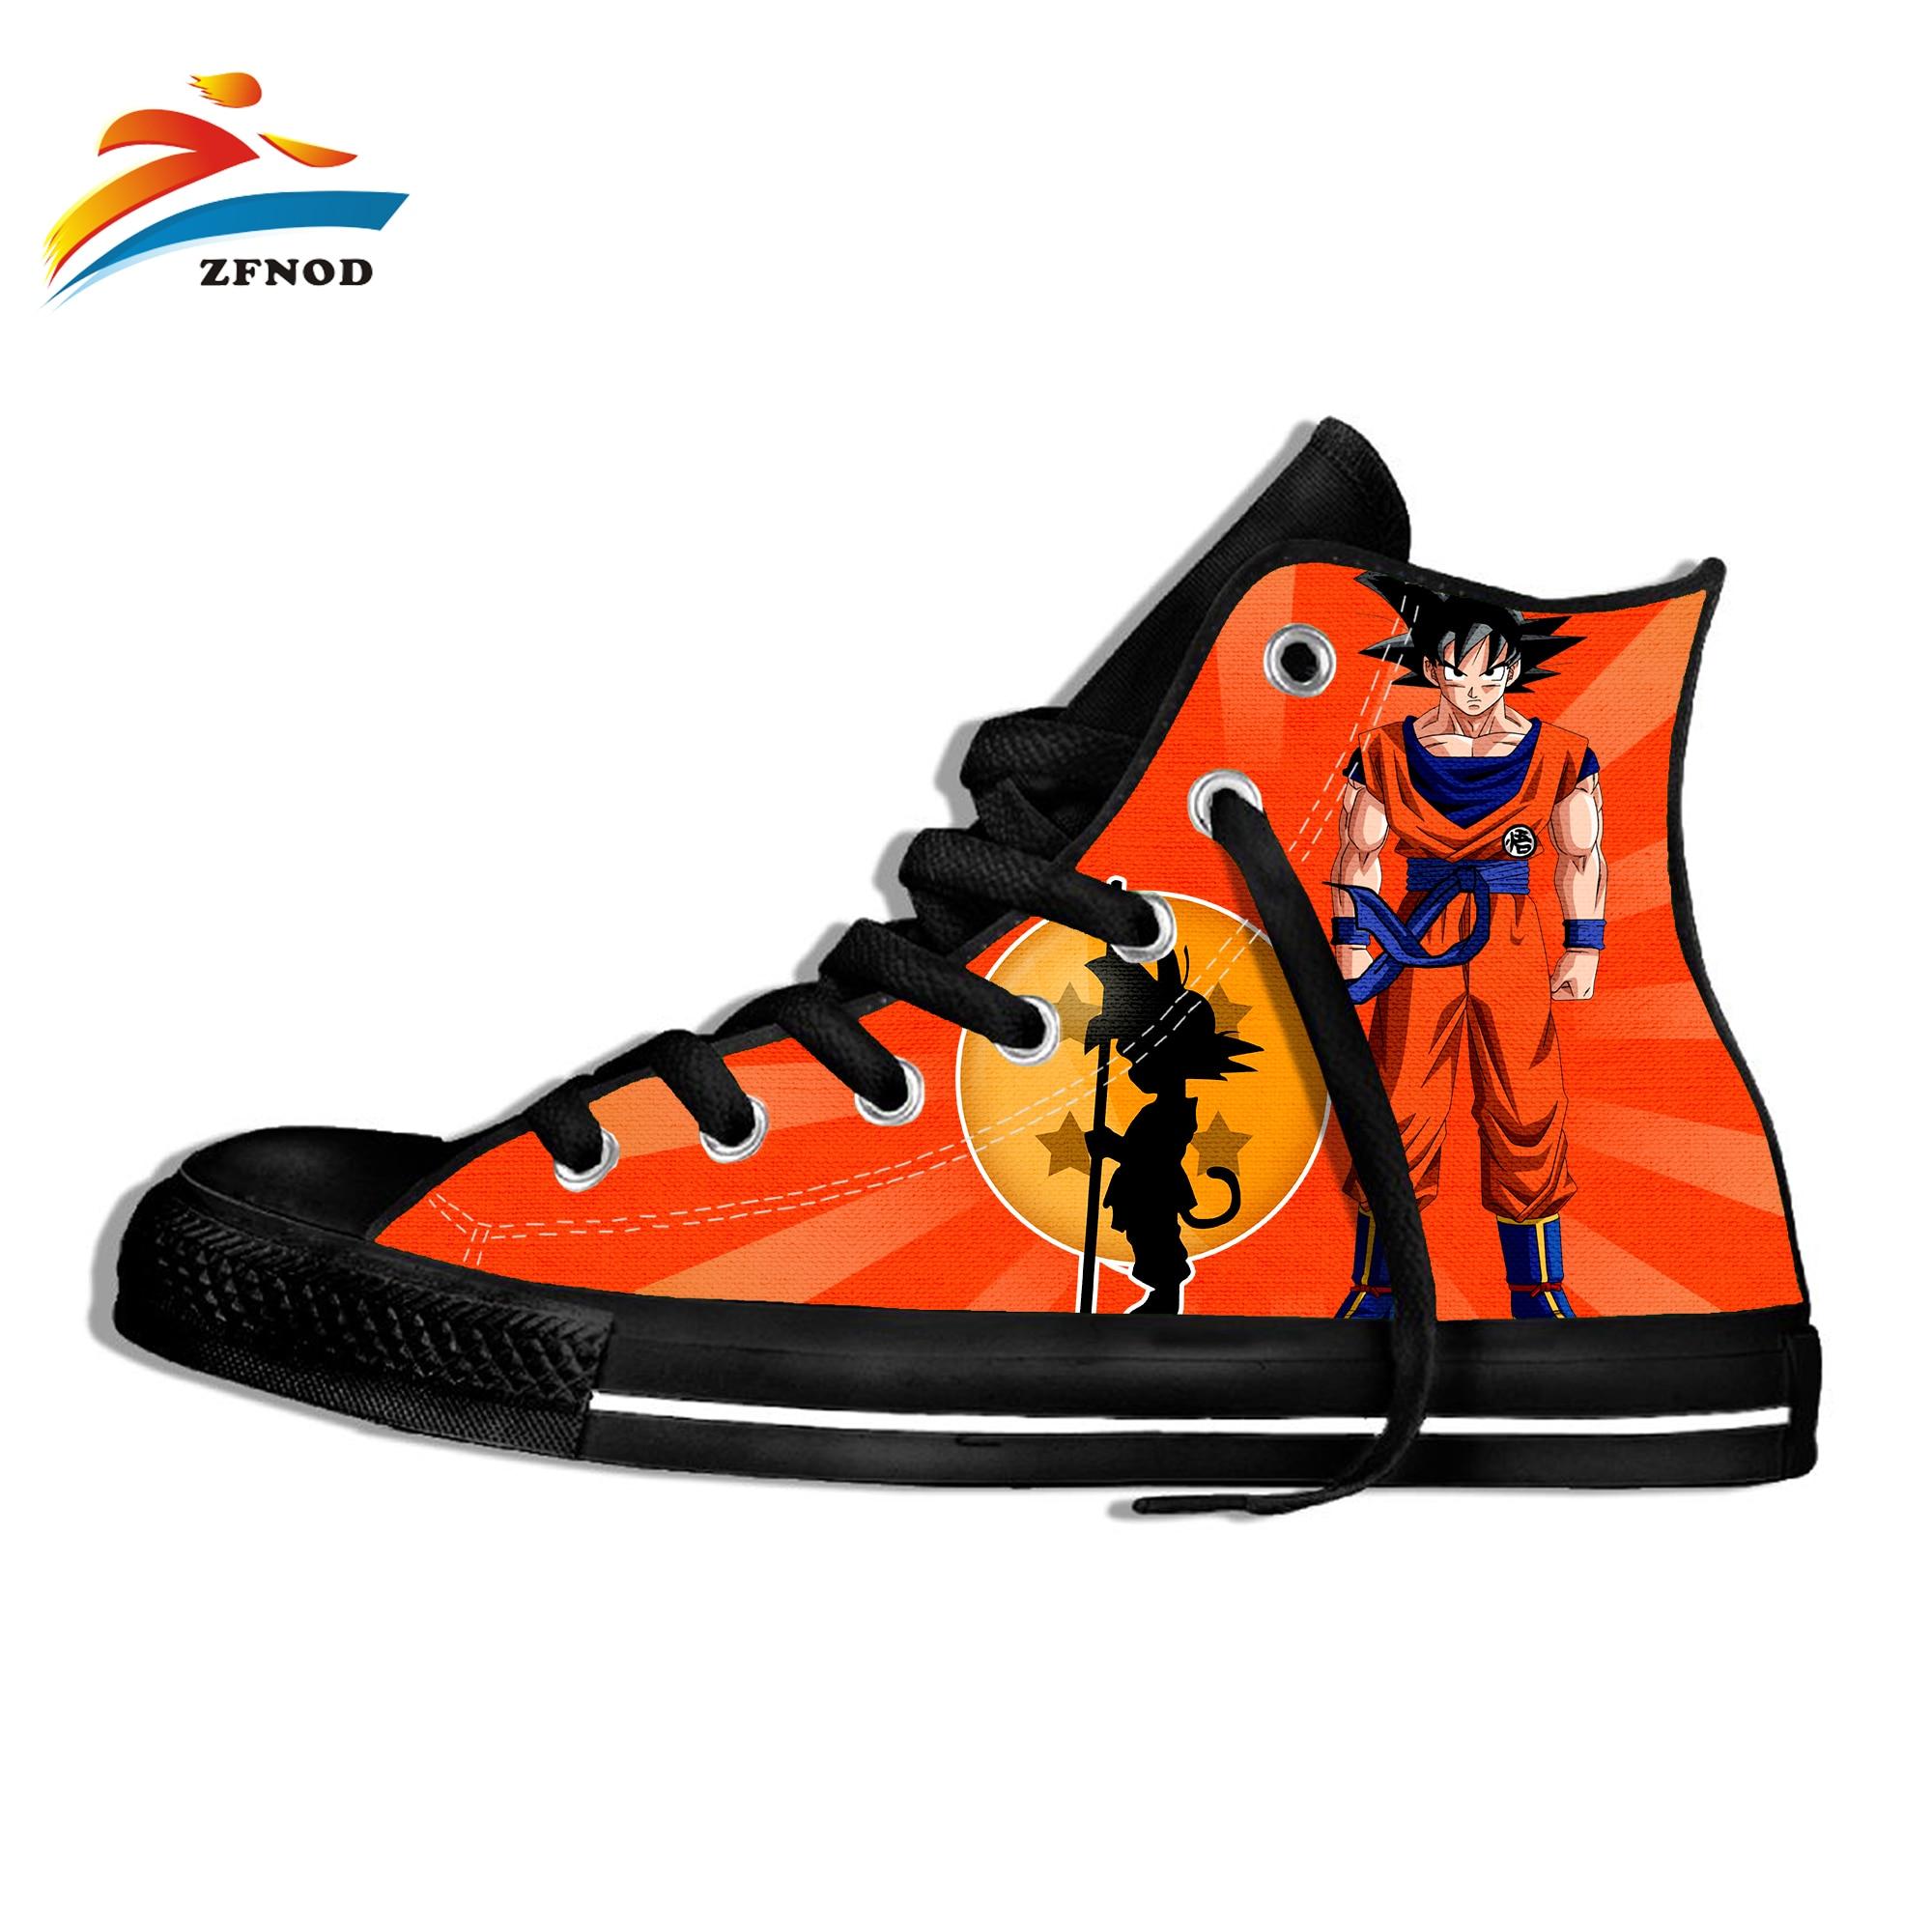 Dragon Ball Shoes 3D Printed Anime Divertente Hip Hop 3D Printing Harajuku Goku Summer Hi Tops Vulcanized Shoes